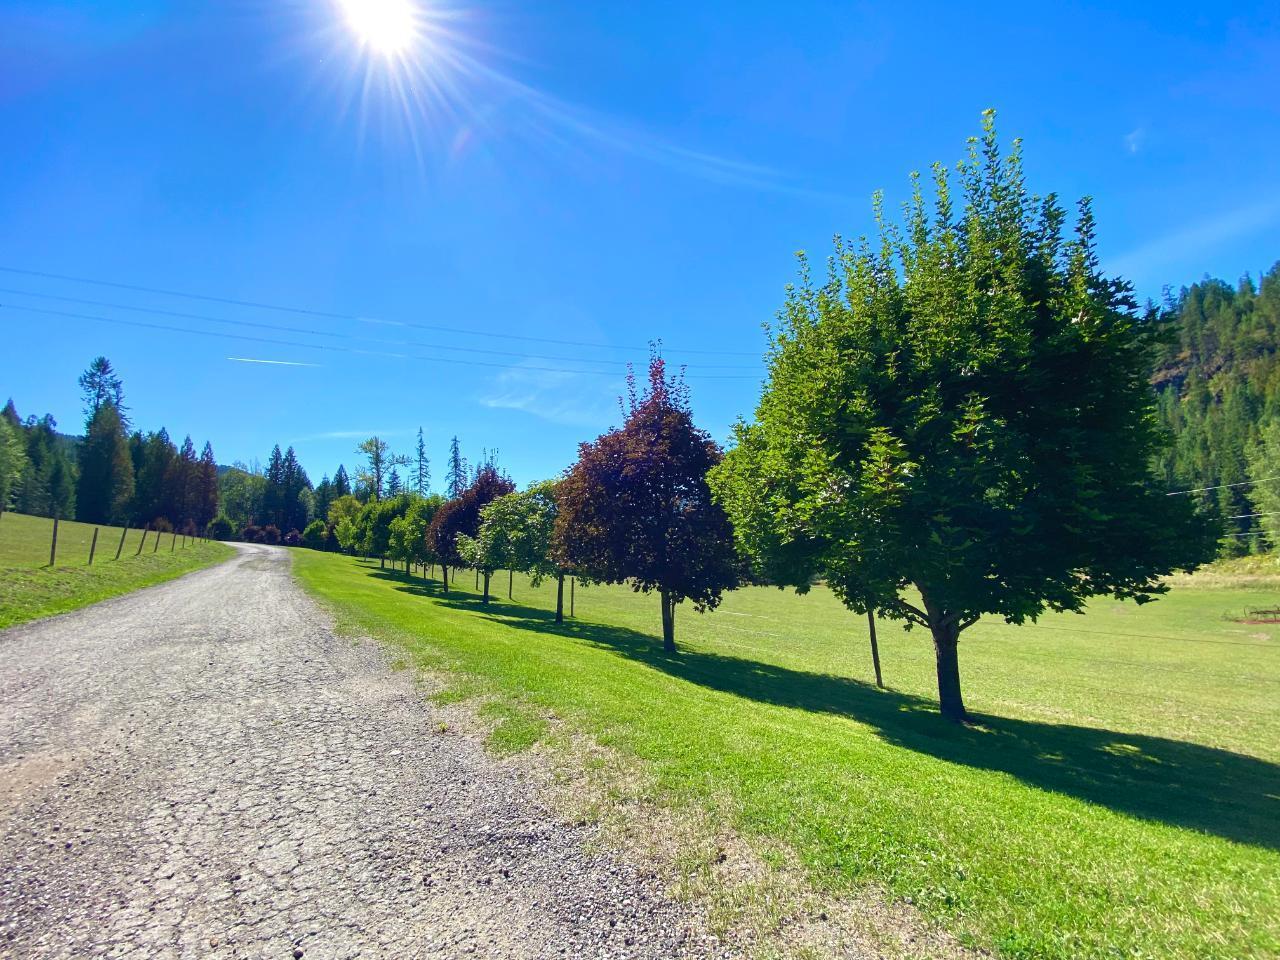 2505 Barley Road, Rossland, British Columbia  V0G 1Y0 - Photo 5 - 2461148